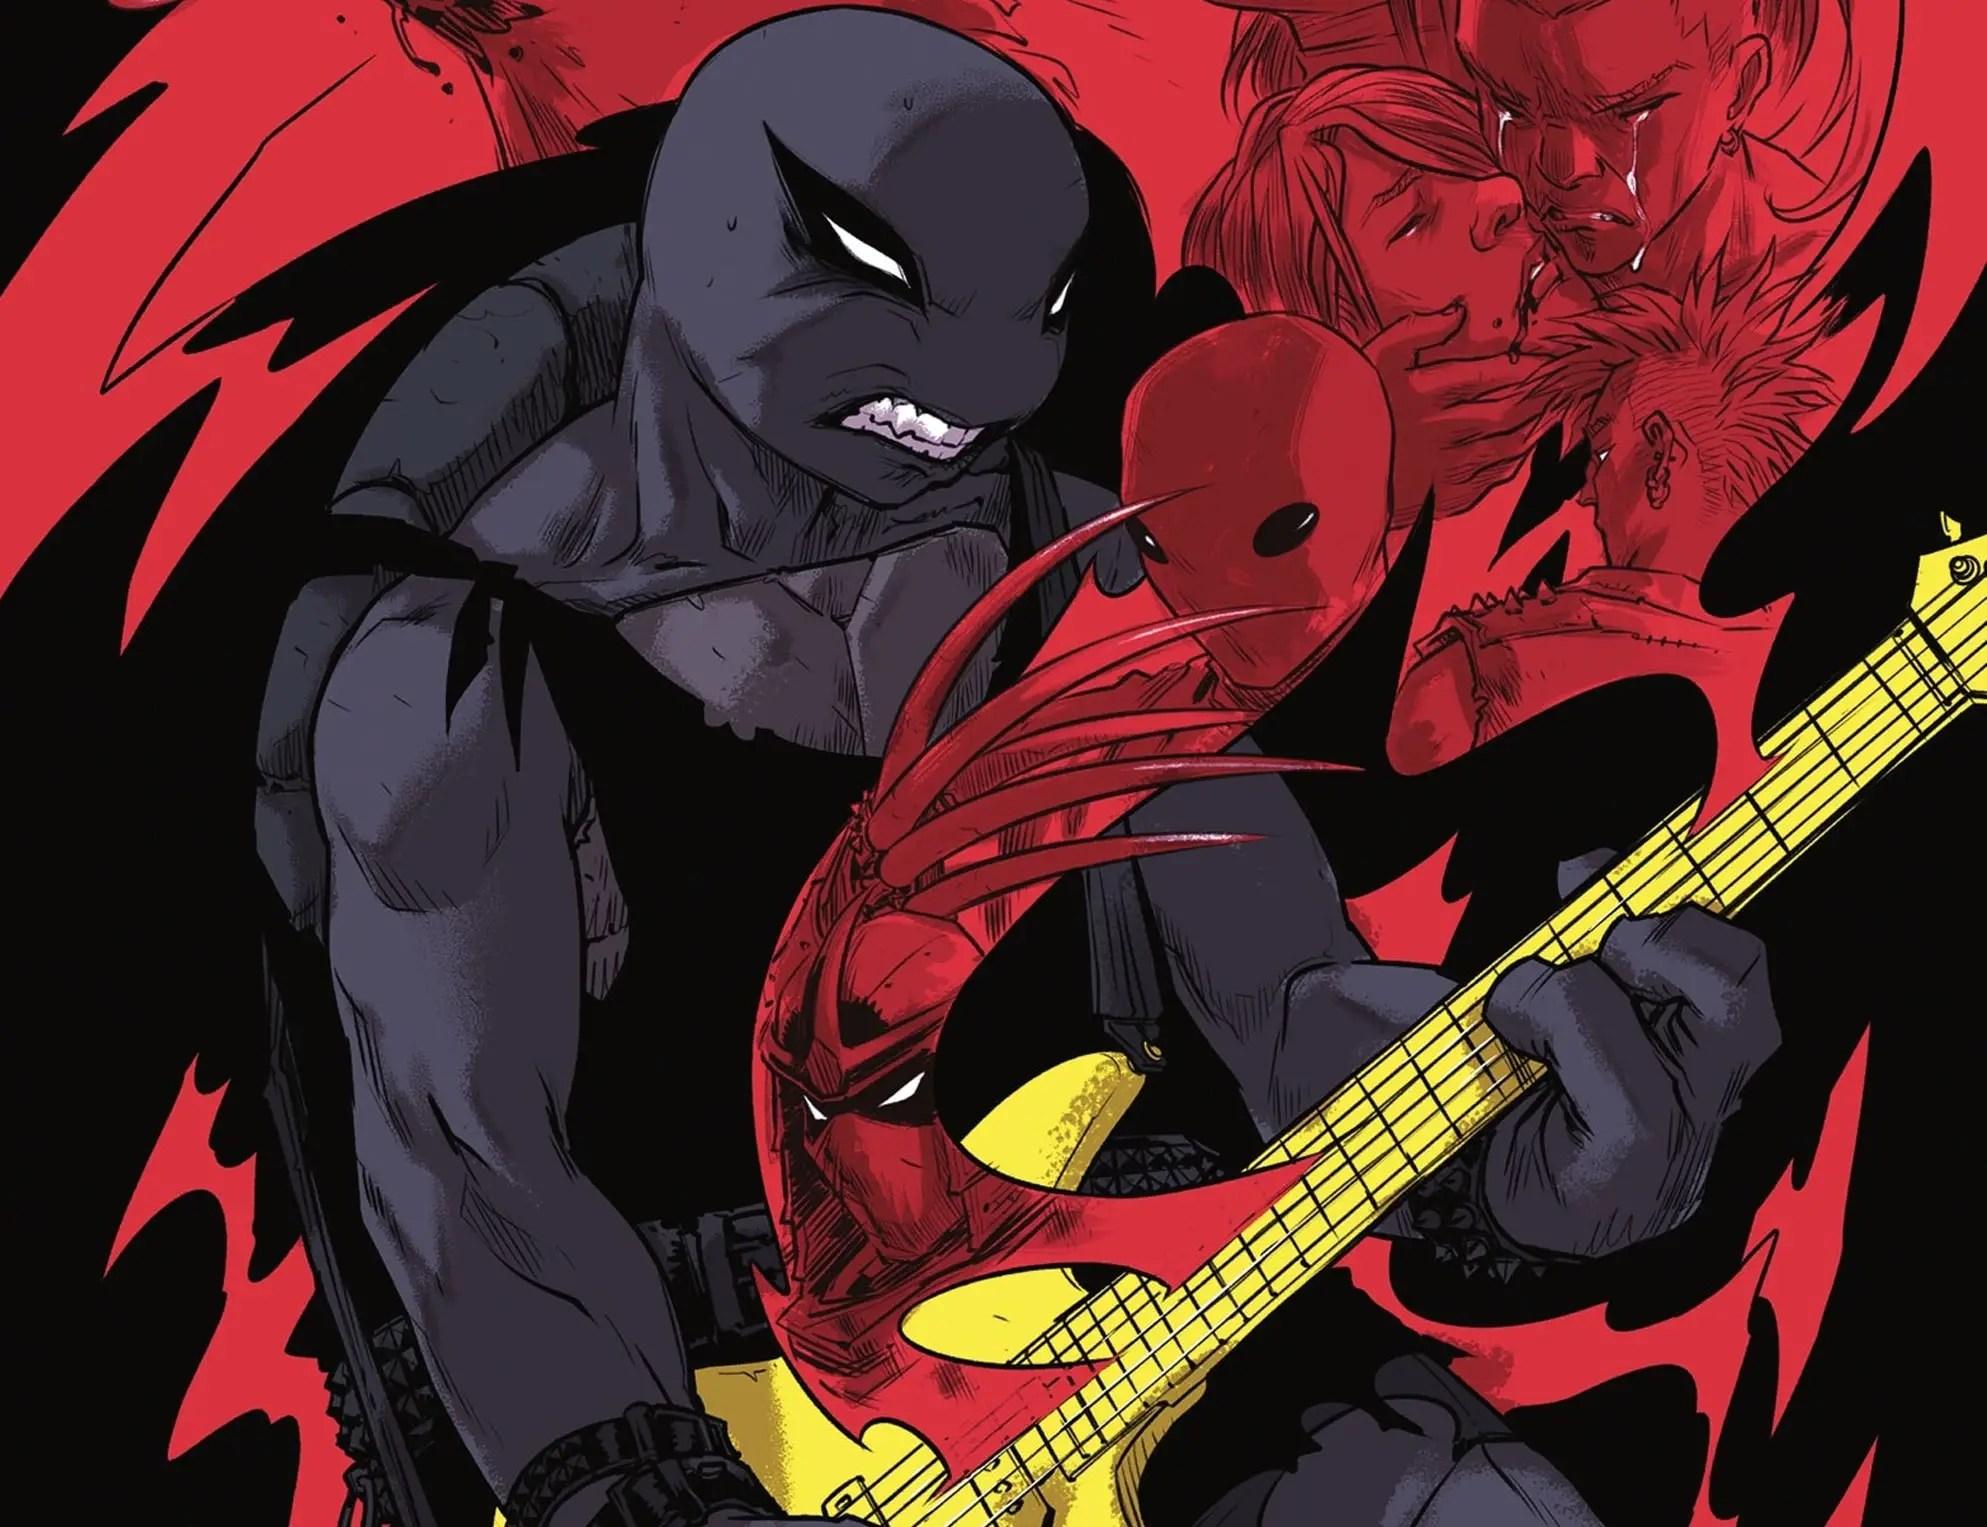 'Teenage Mutant Ninja Turtles' #117 gets the ball rolling in a big way